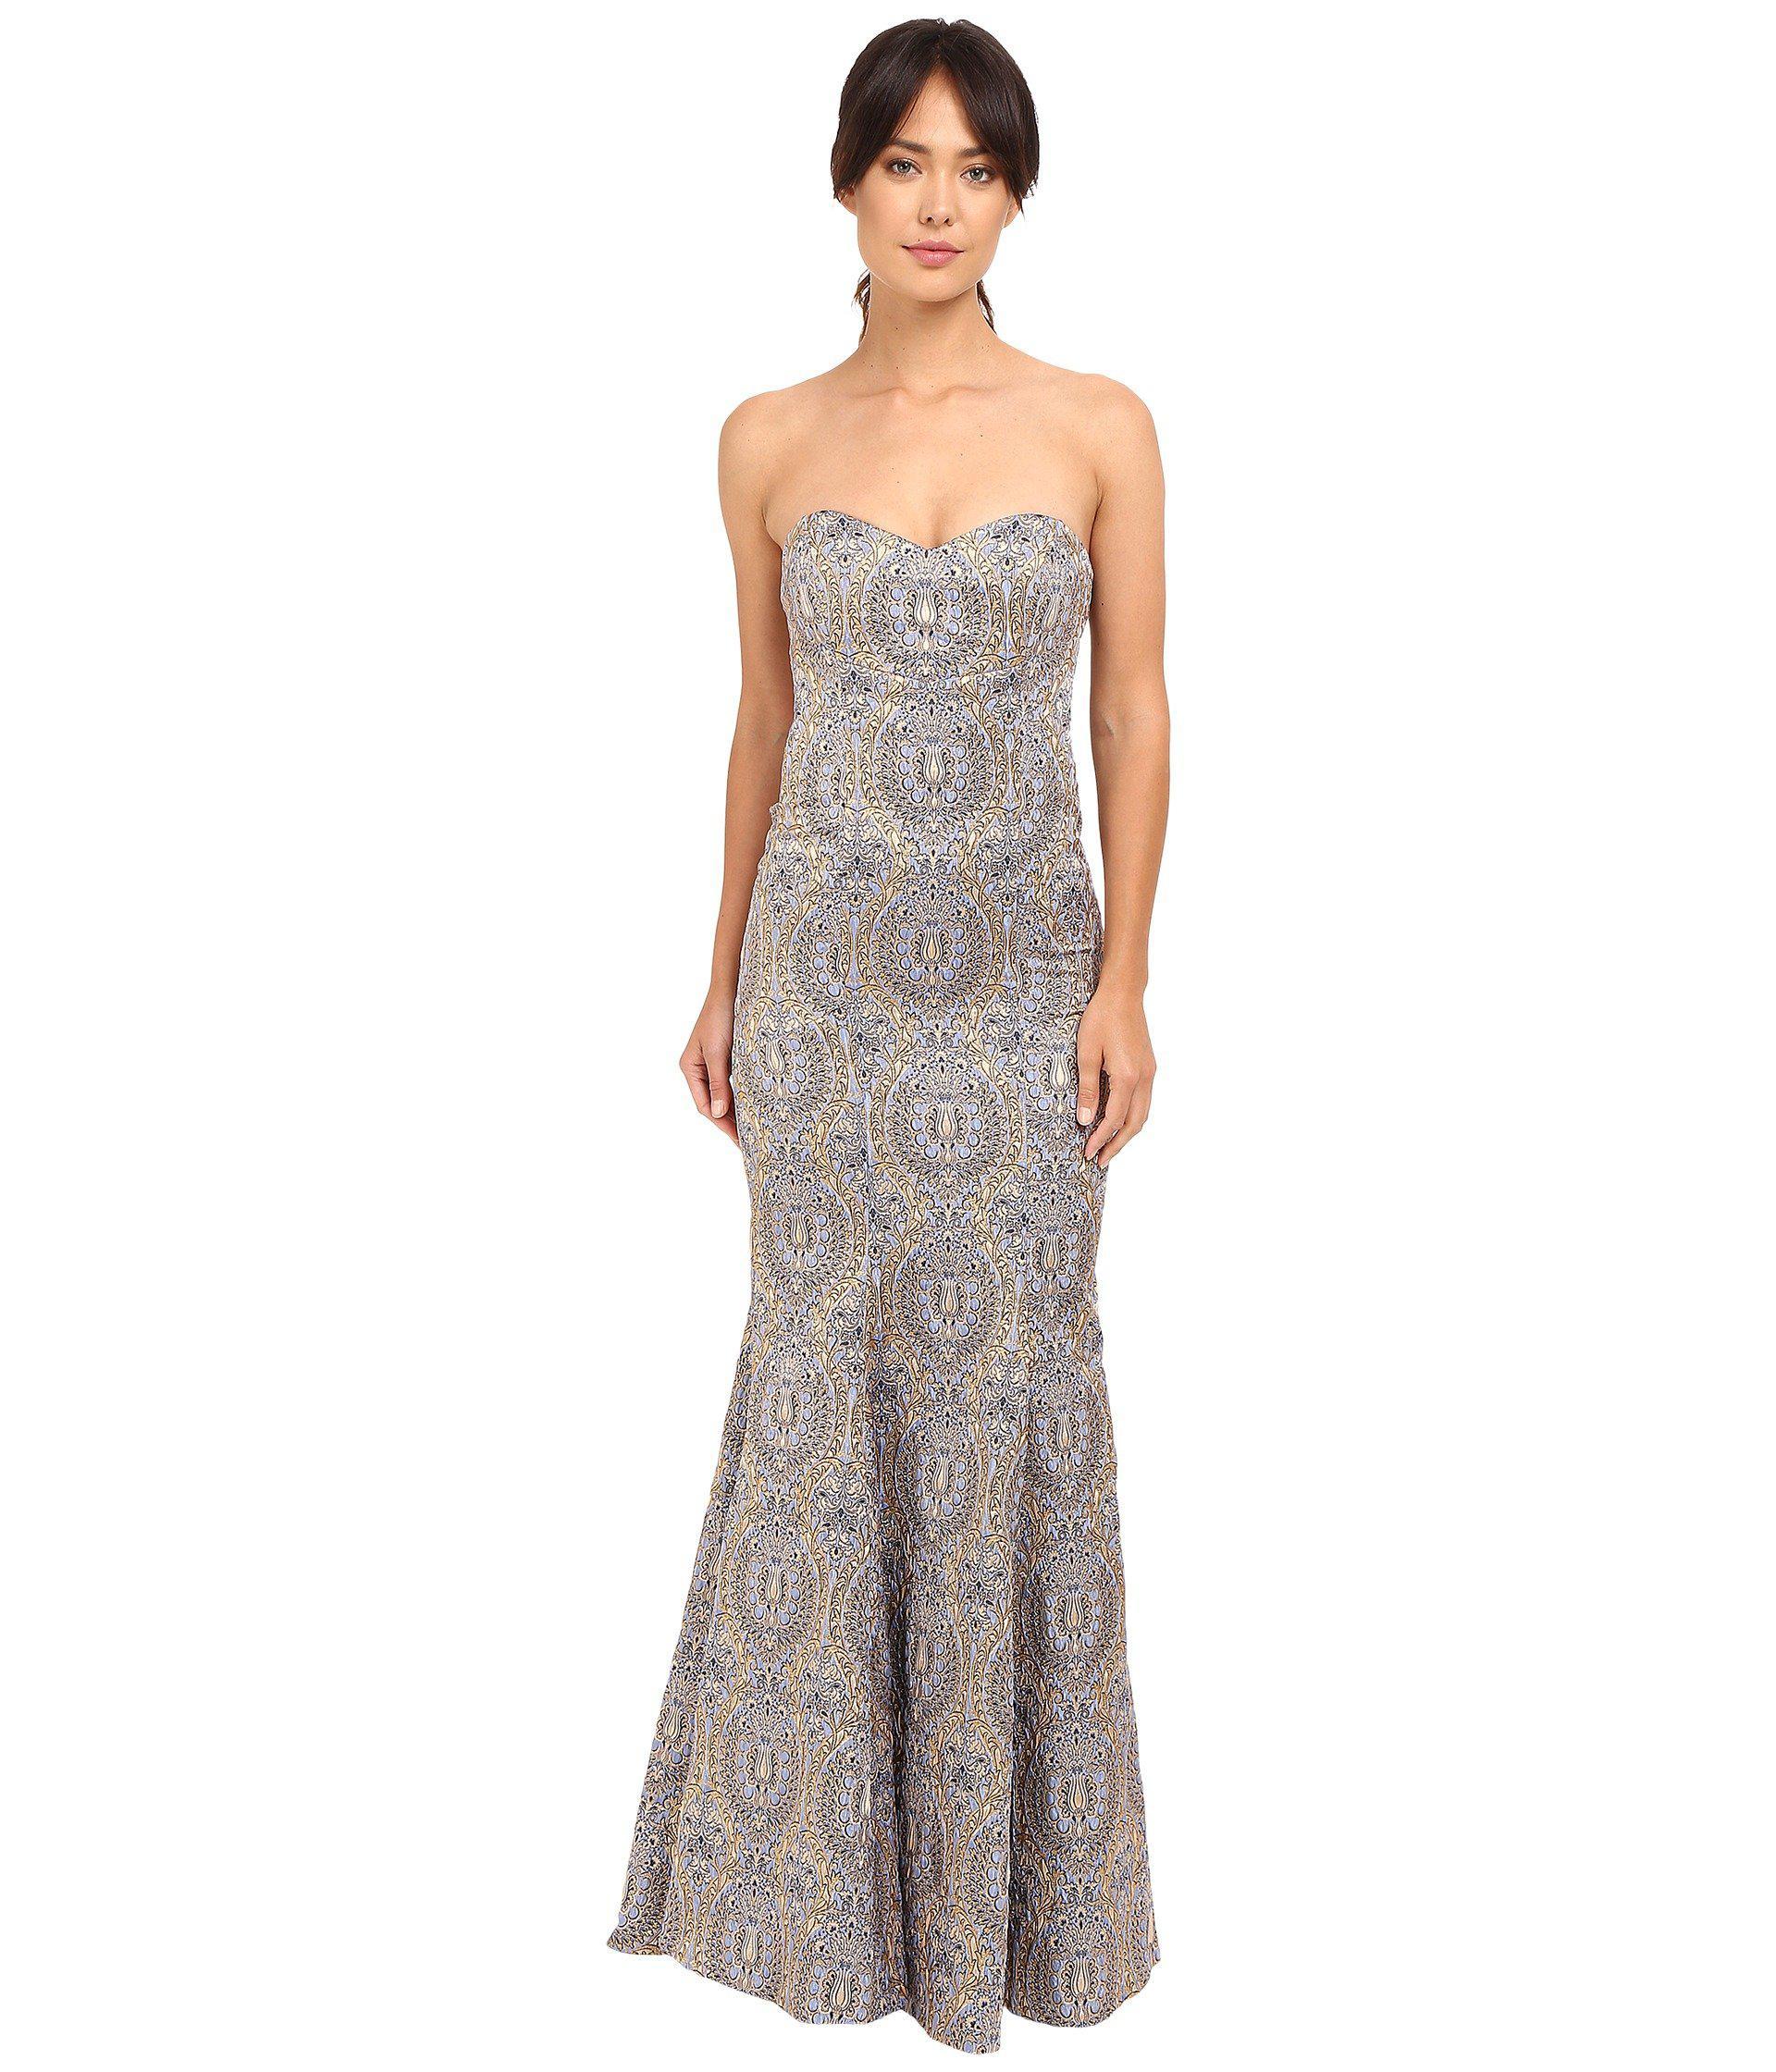 Lyst - Nicole miller Dakota Embroidered Gown